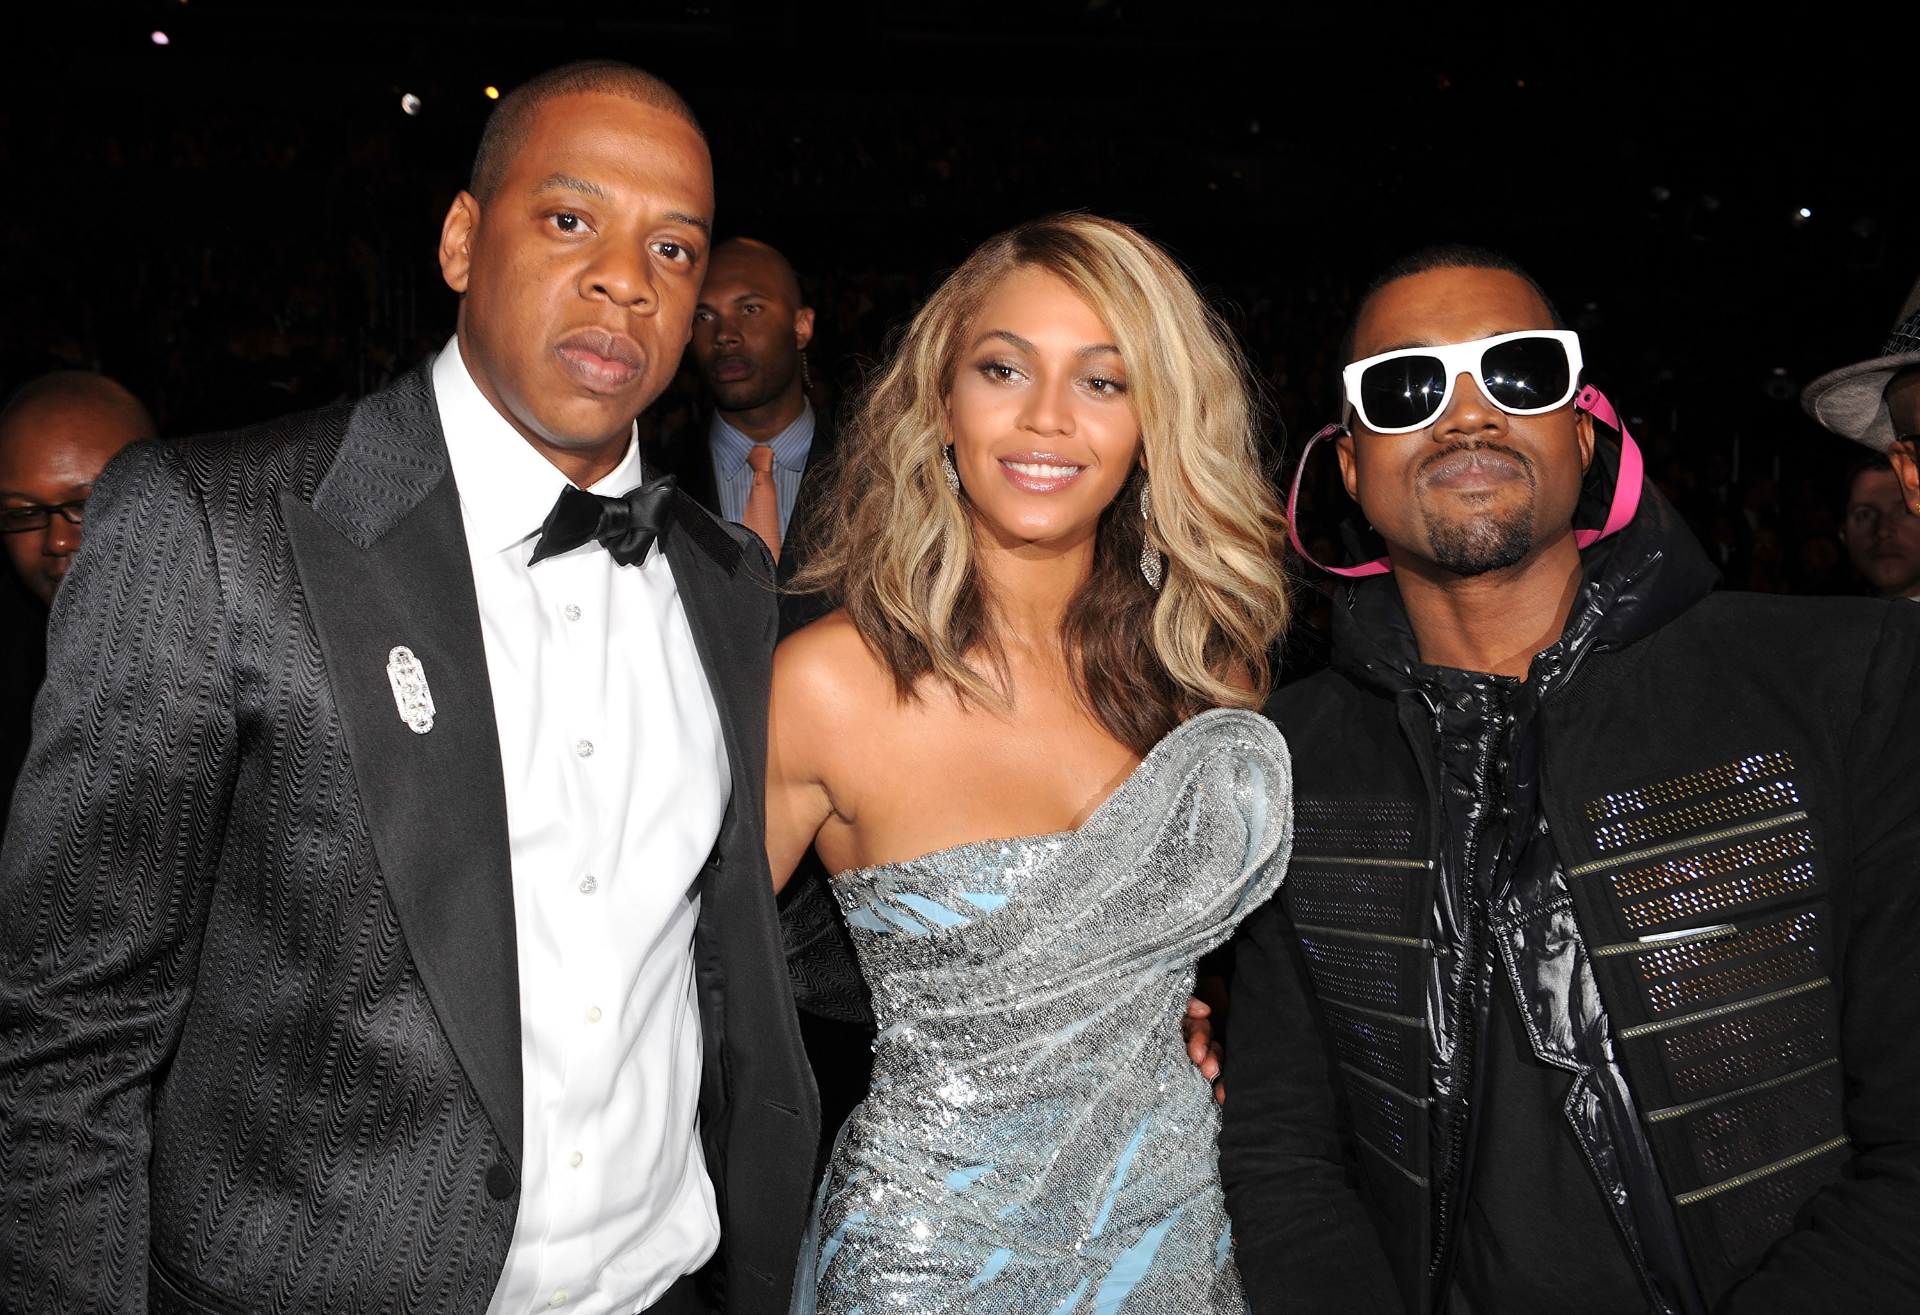 Three celebrities attend an event.